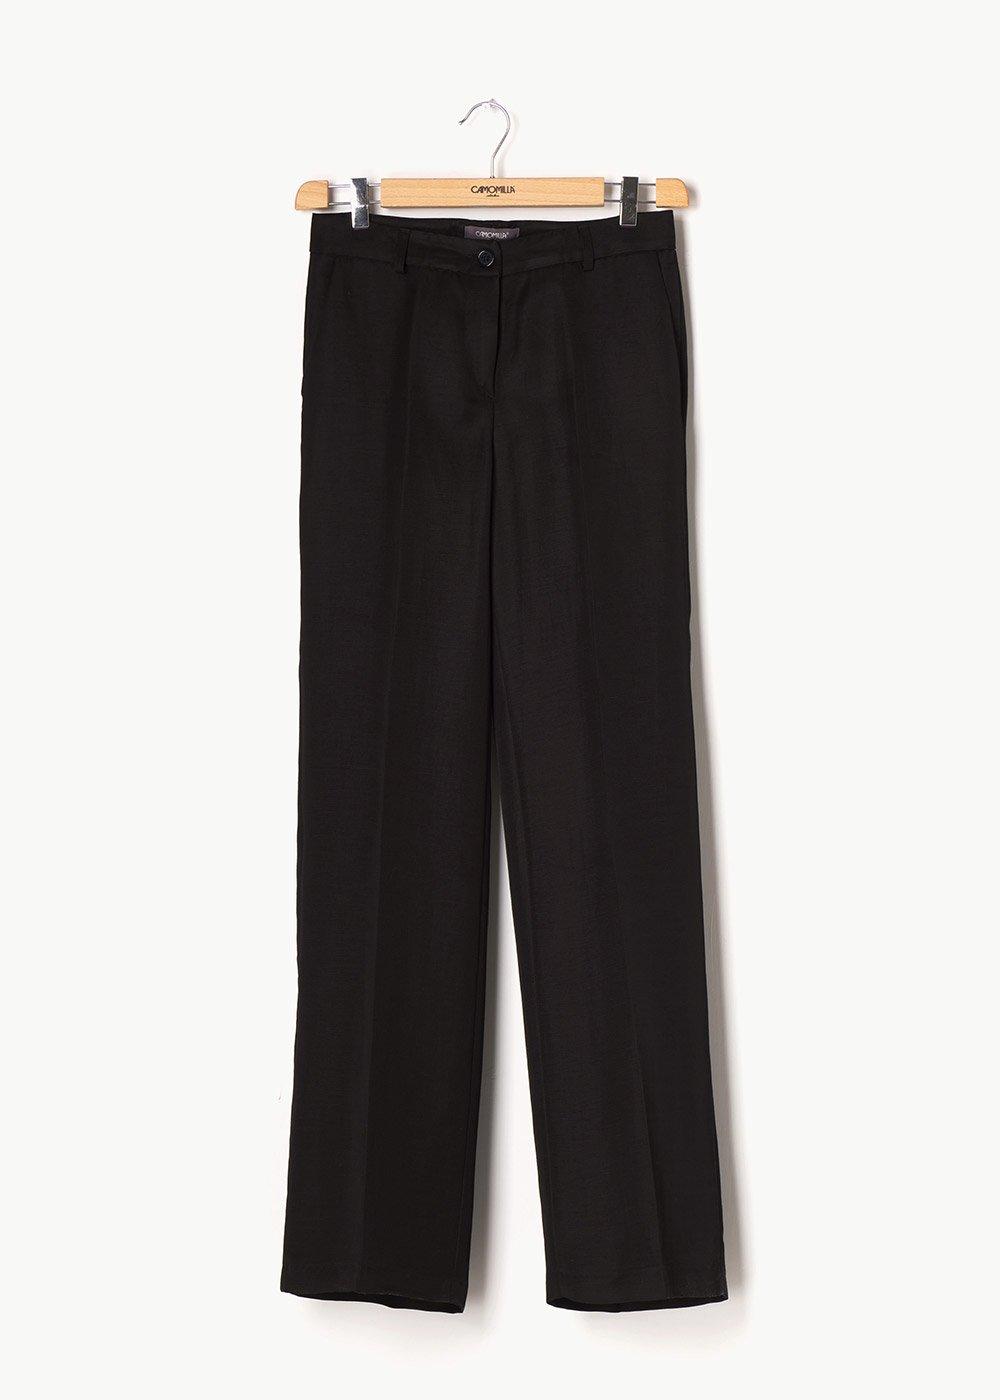 Pantalone modello Giorgia in tessuto misto lino - Black - Donna